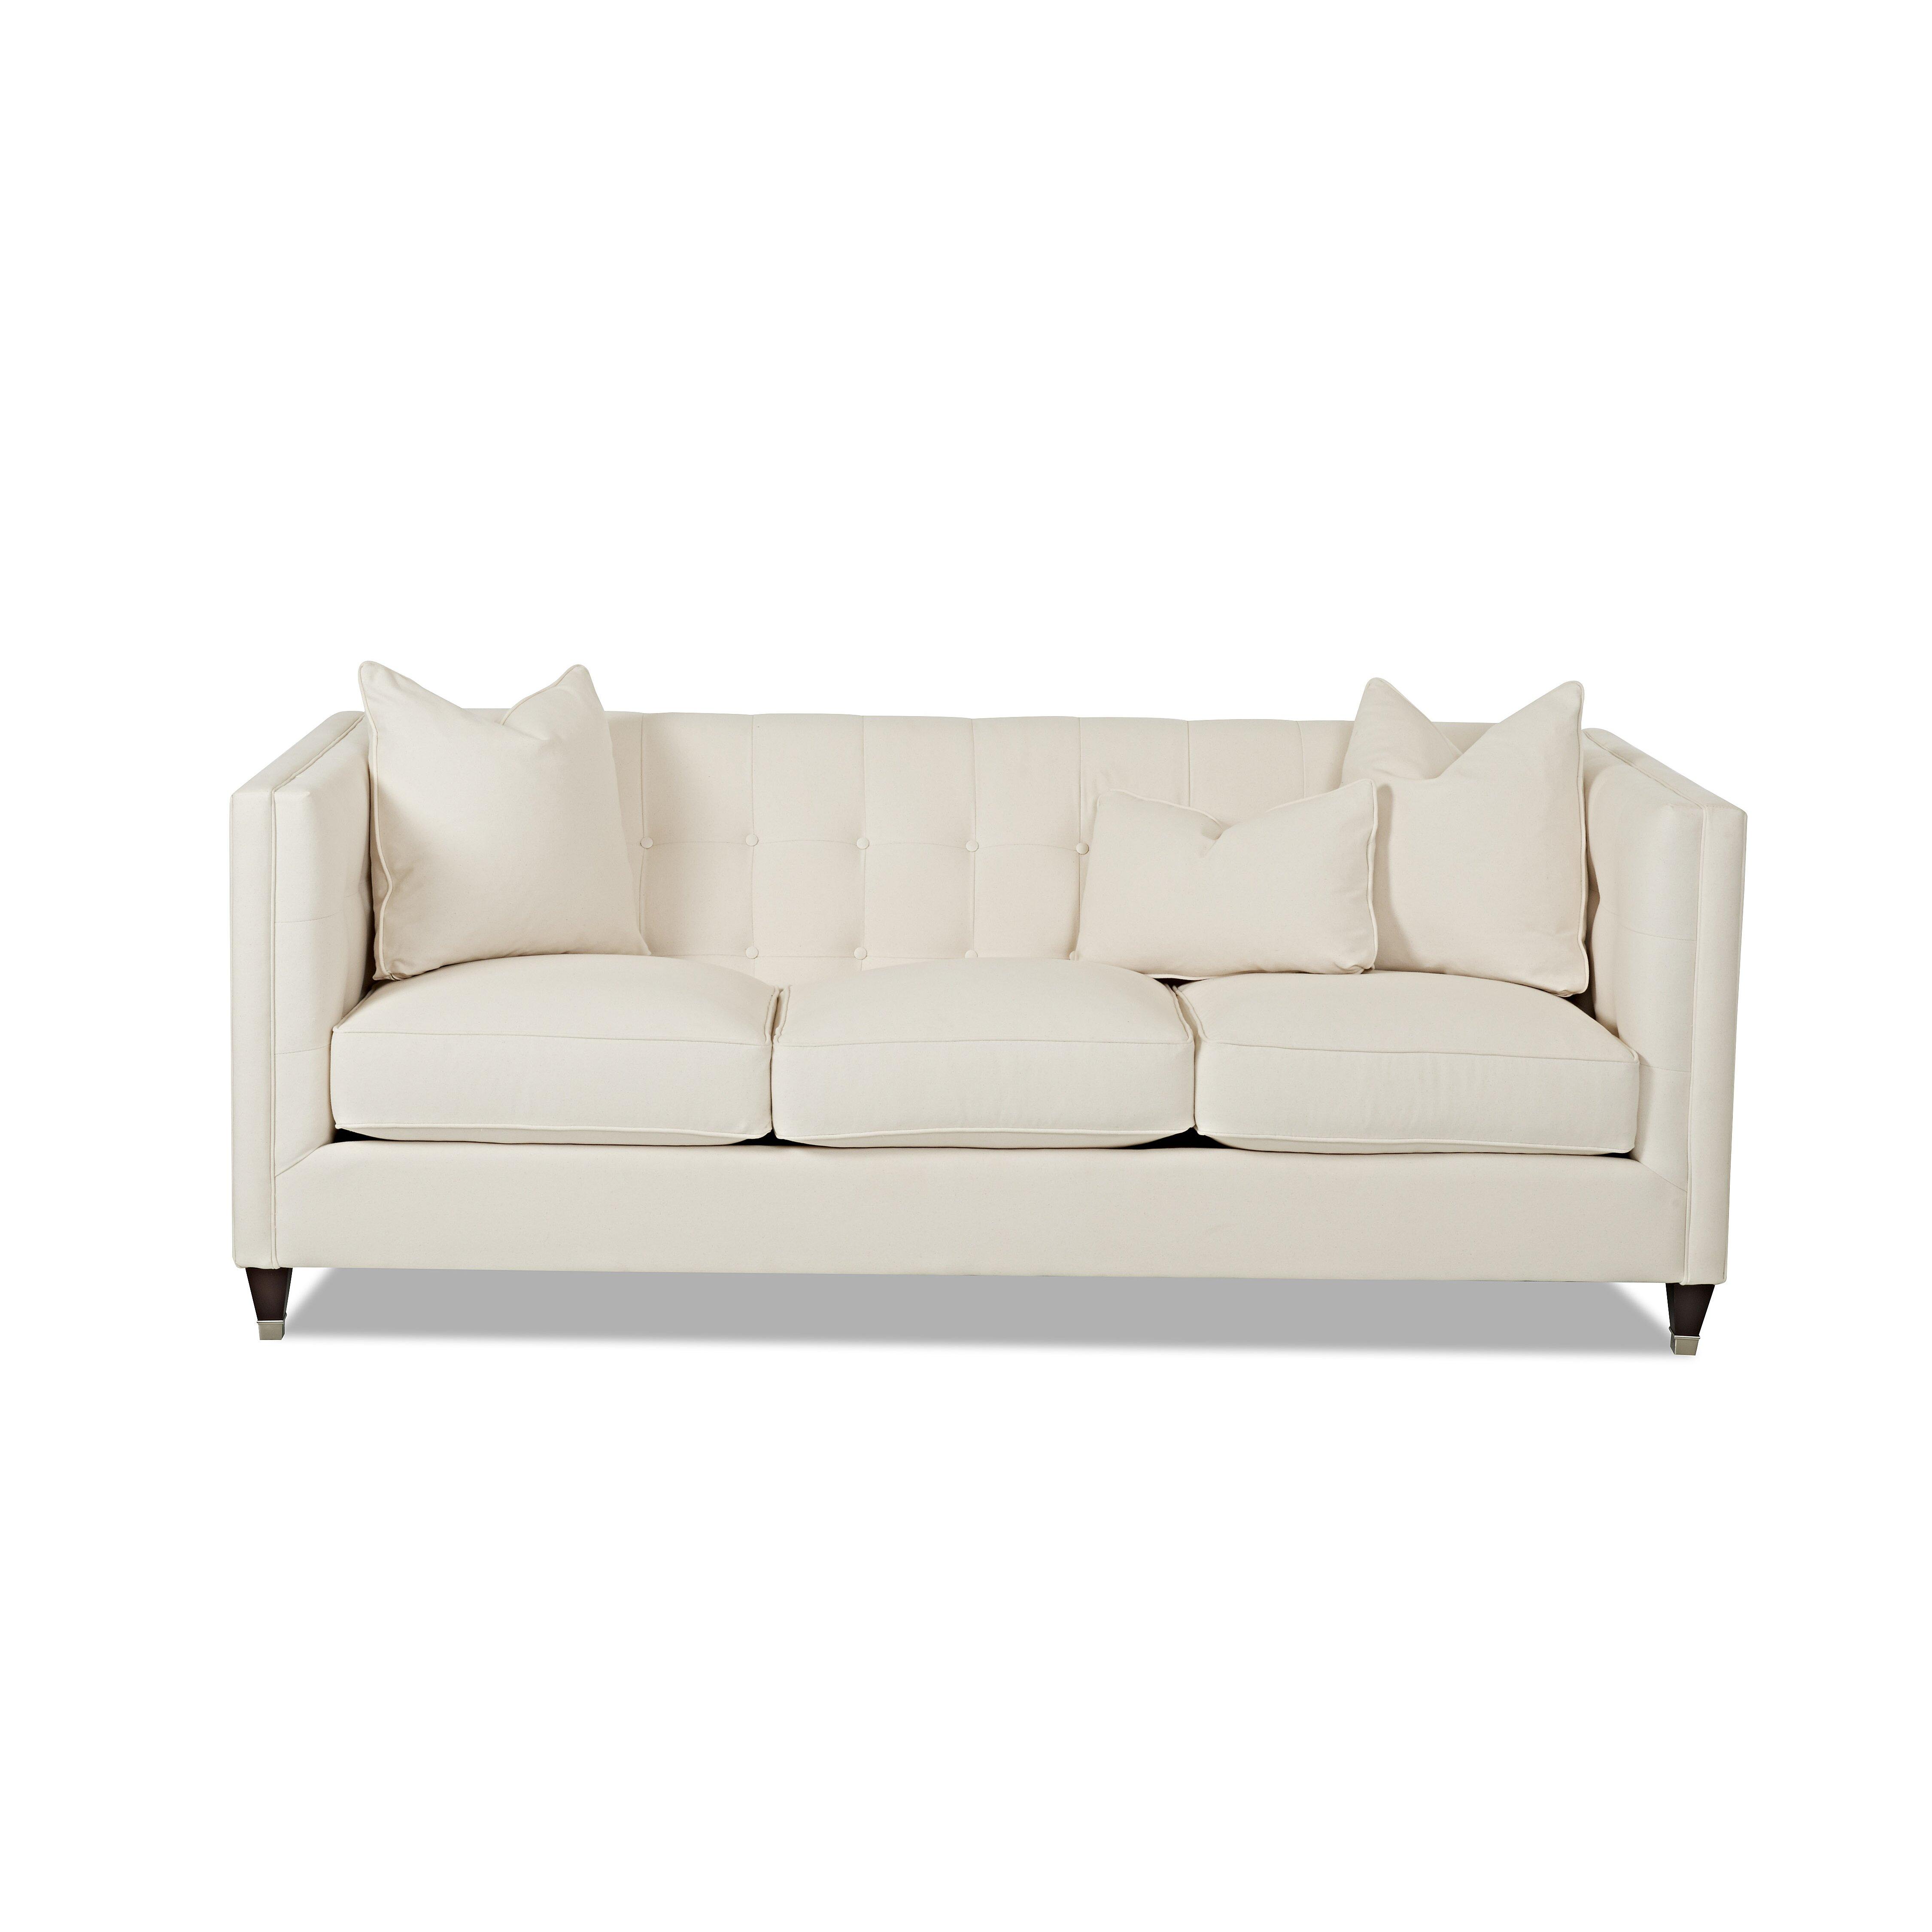 Wayfair Custom Upholstery Jessica Sofa Reviews